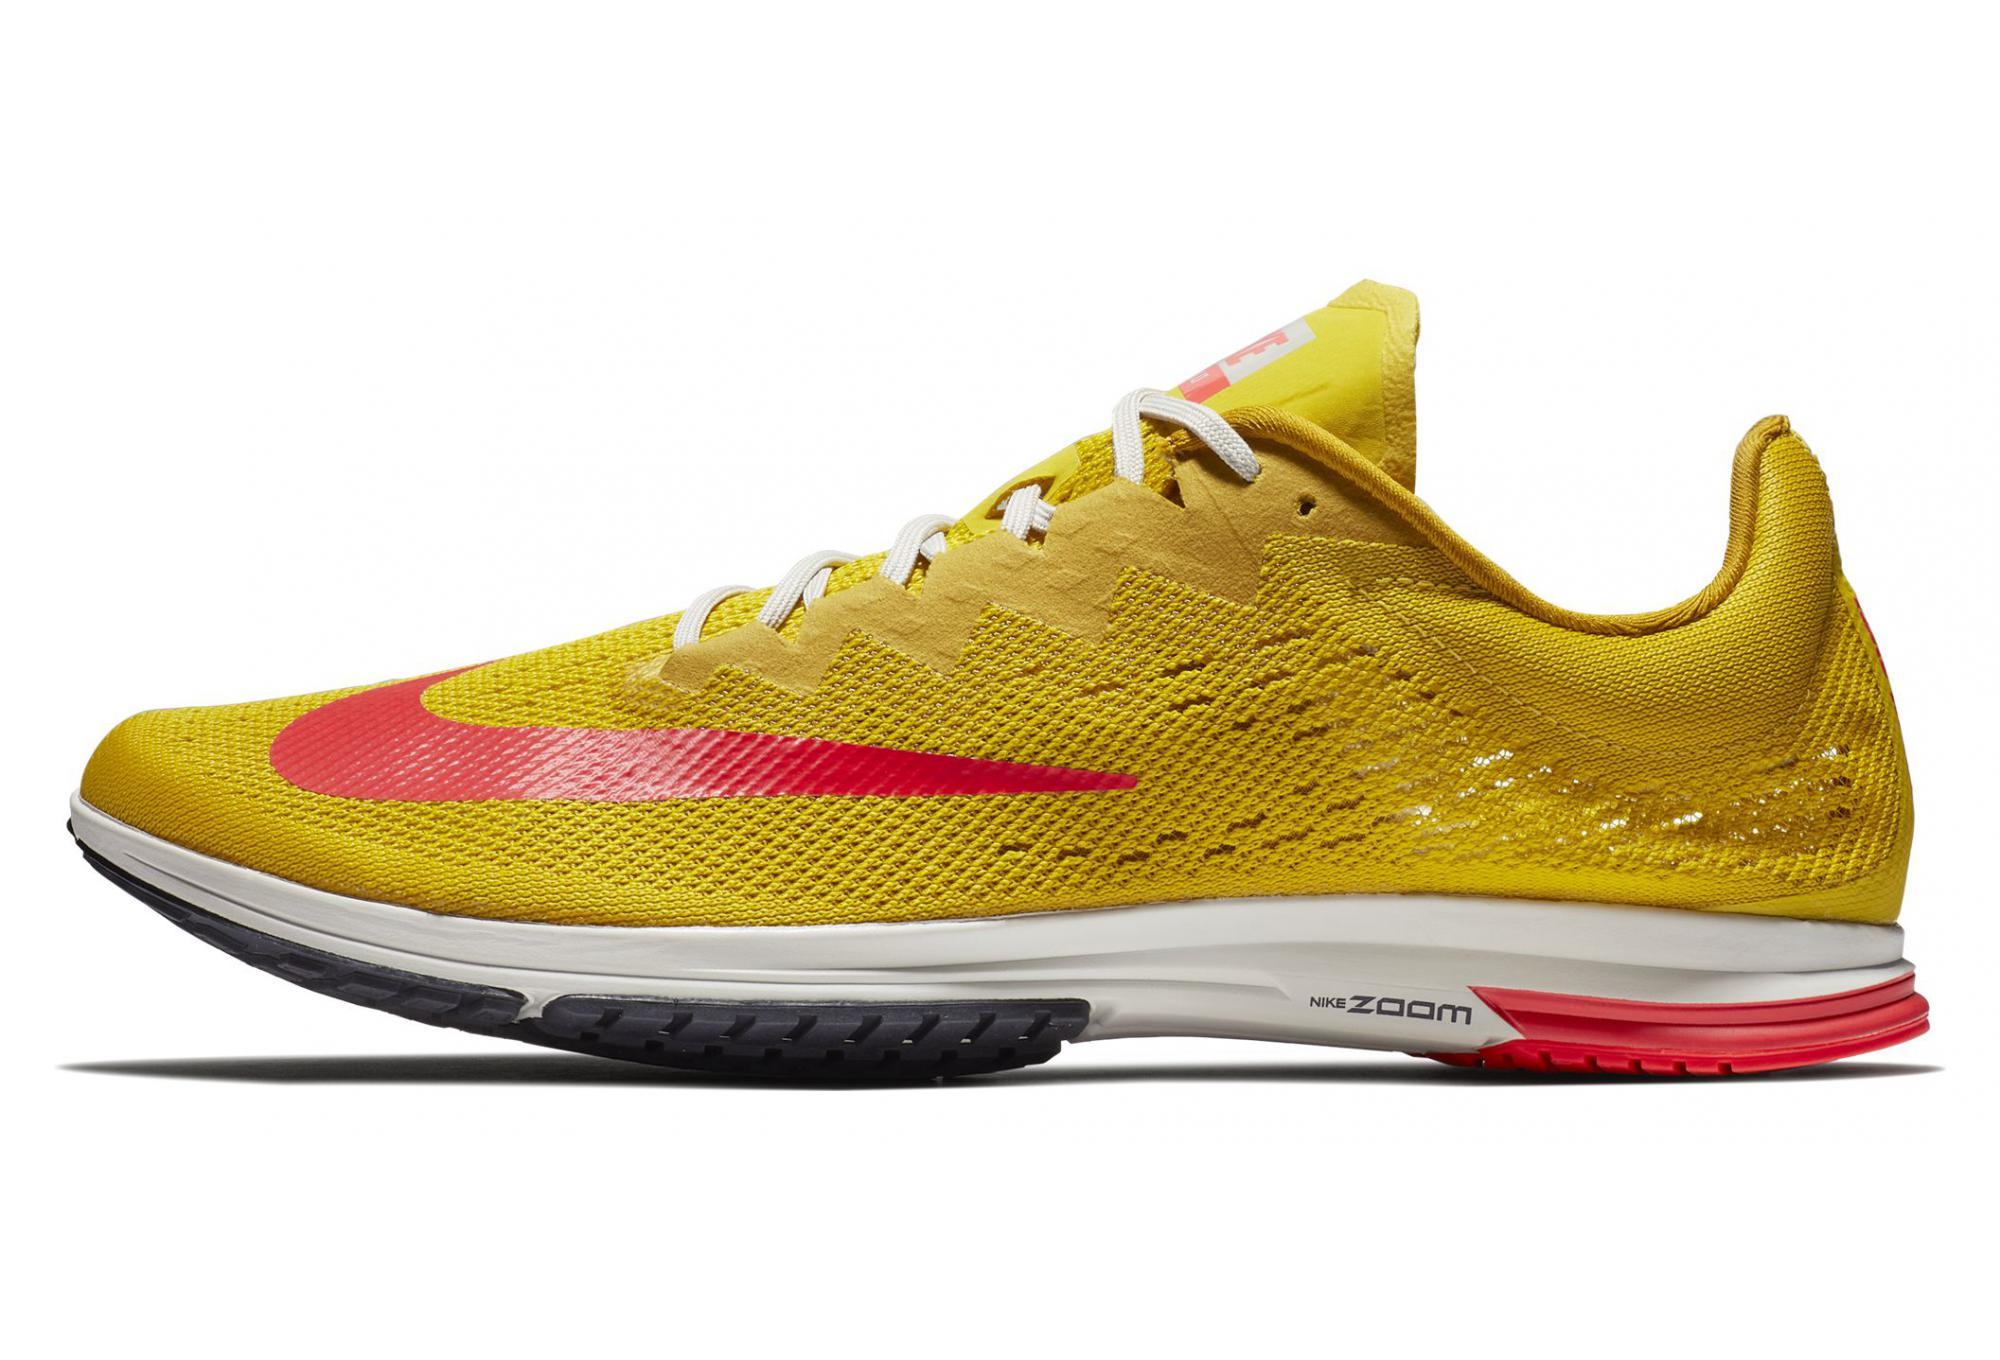 Nike Schuhe Zoom Streak LT 4 Gelb Orange Unisex